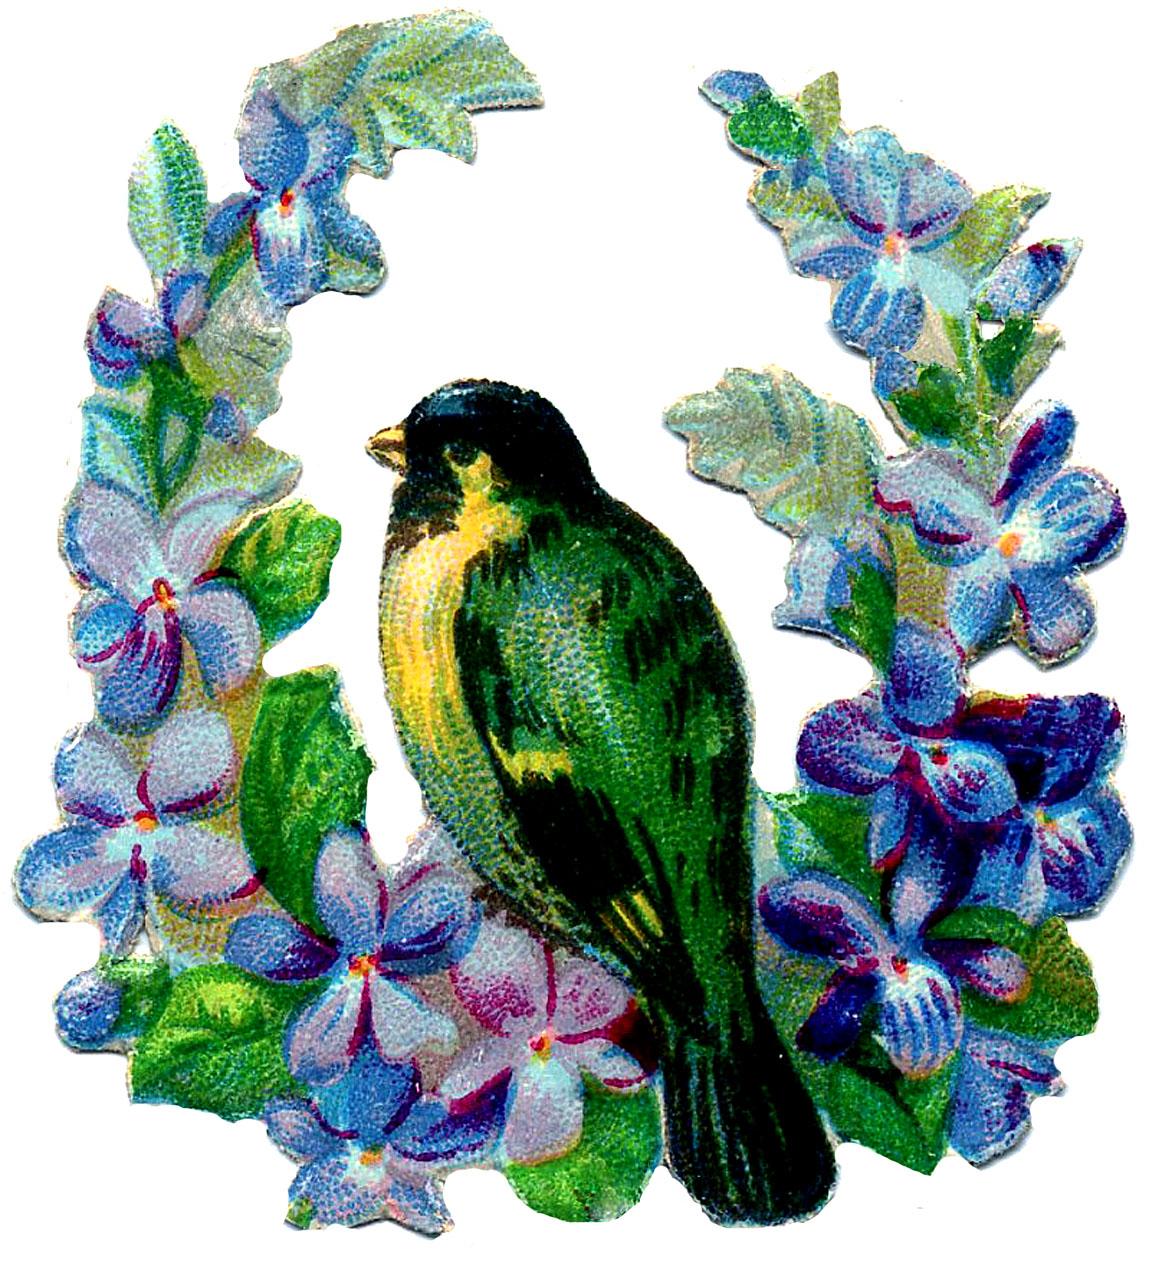 http://thegraphicsfairy.com/wp-content/uploads/blogger/-xN6YtGJWSNM/T9KtbF49I6I/AAAAAAAASK8/o5OMW7oKX6A/s1600/bird-green-flowers-GraphicsFairy.jpg